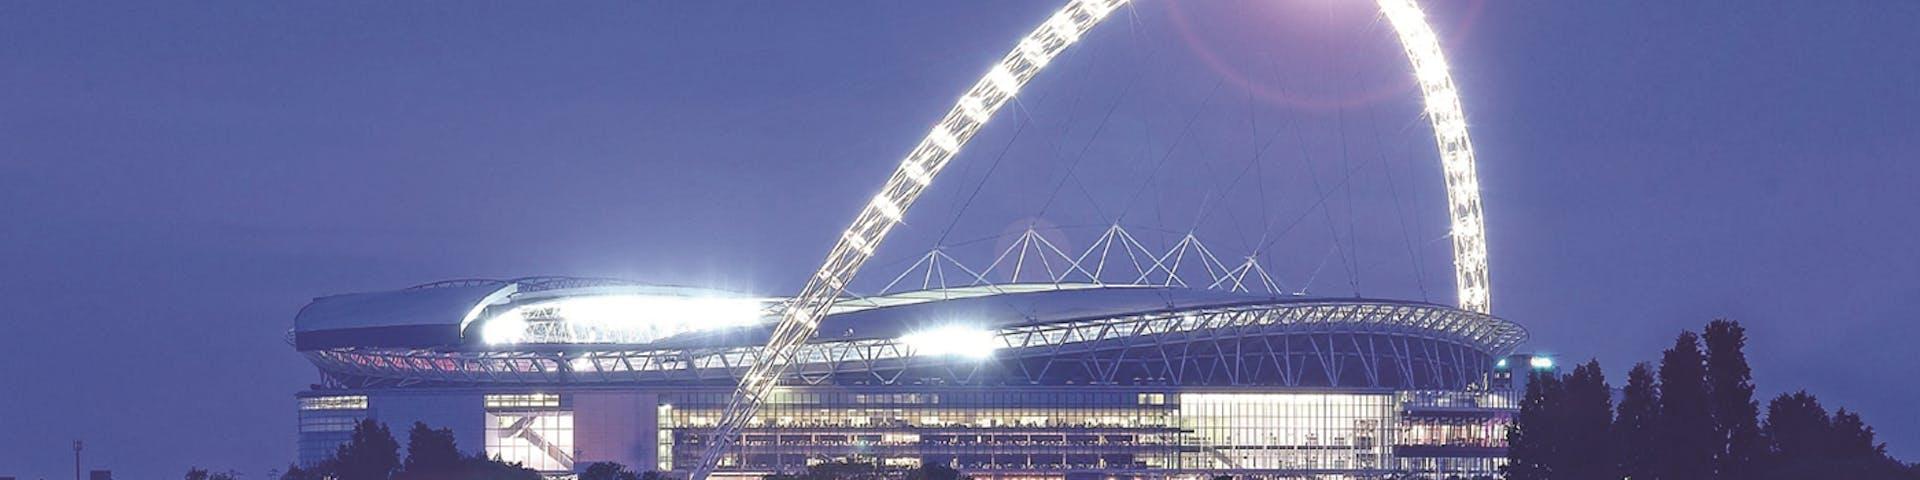 UCFB - London - United Kingdom - DistanceLearningPortal com